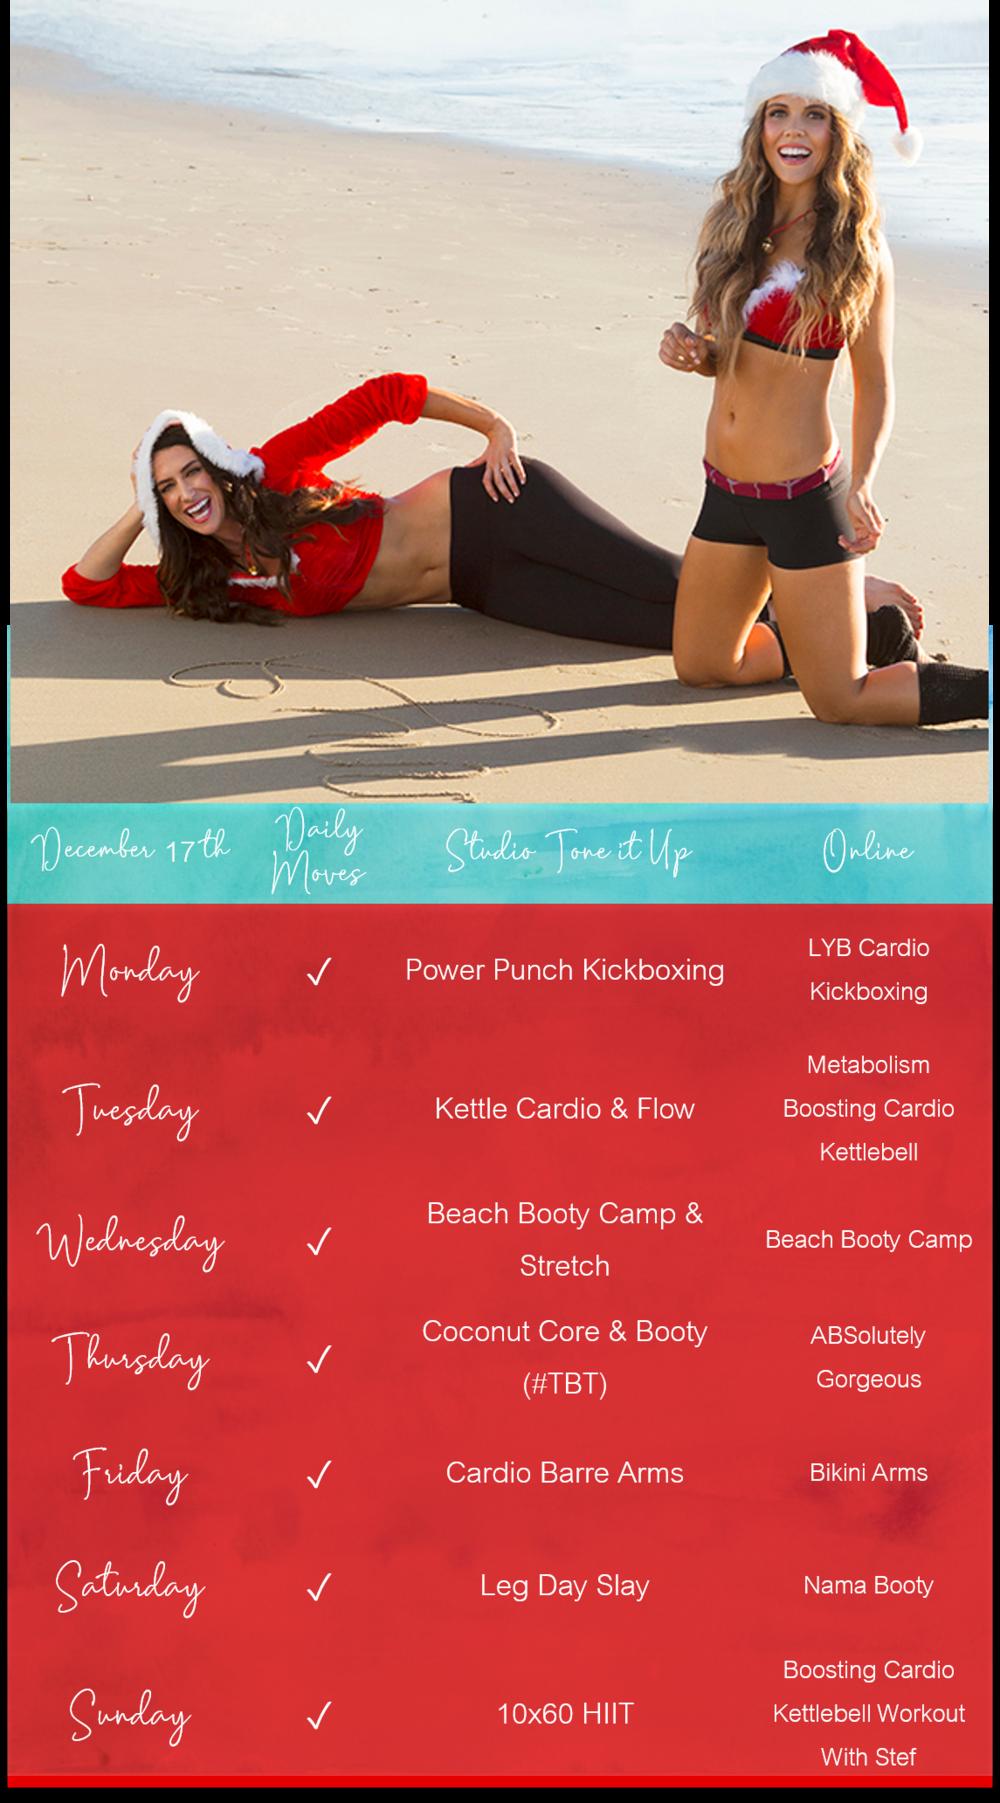 TIU Holiday Hustle Week of December 17th - Click below to download the lockscreen